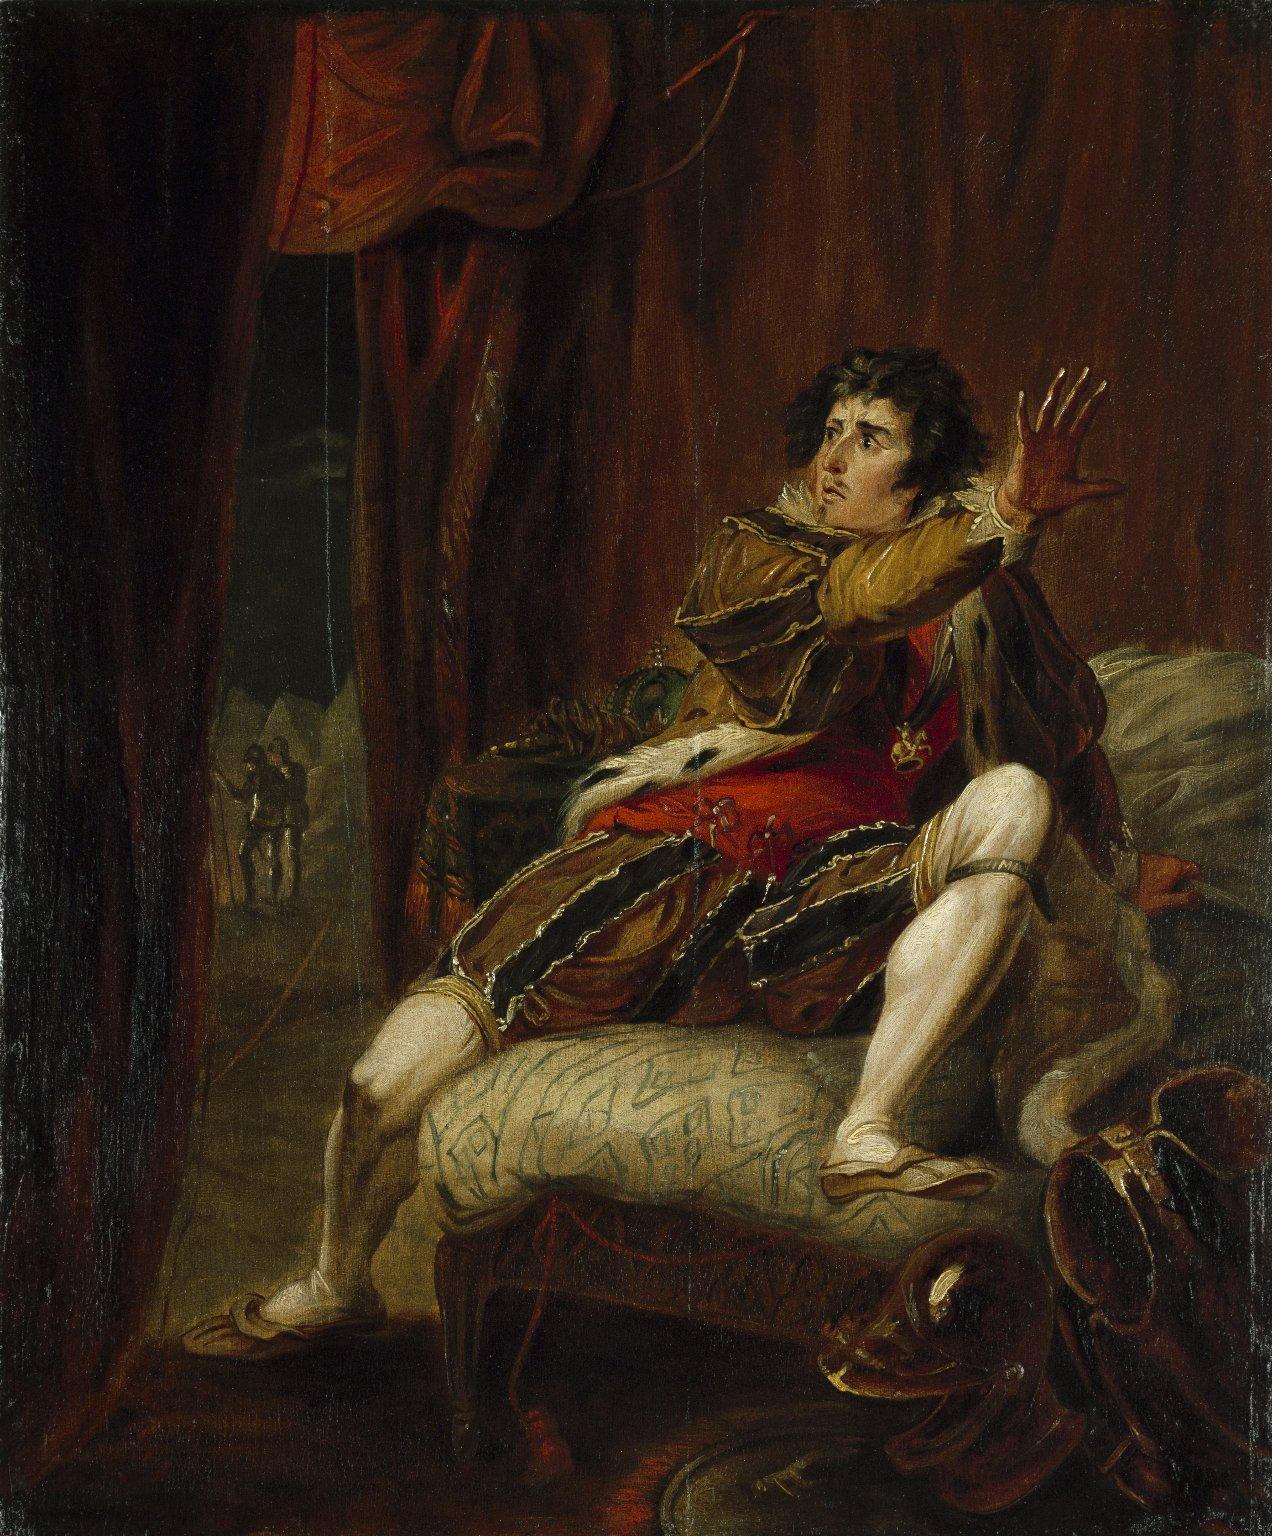 John Philip Kemble as Richard III